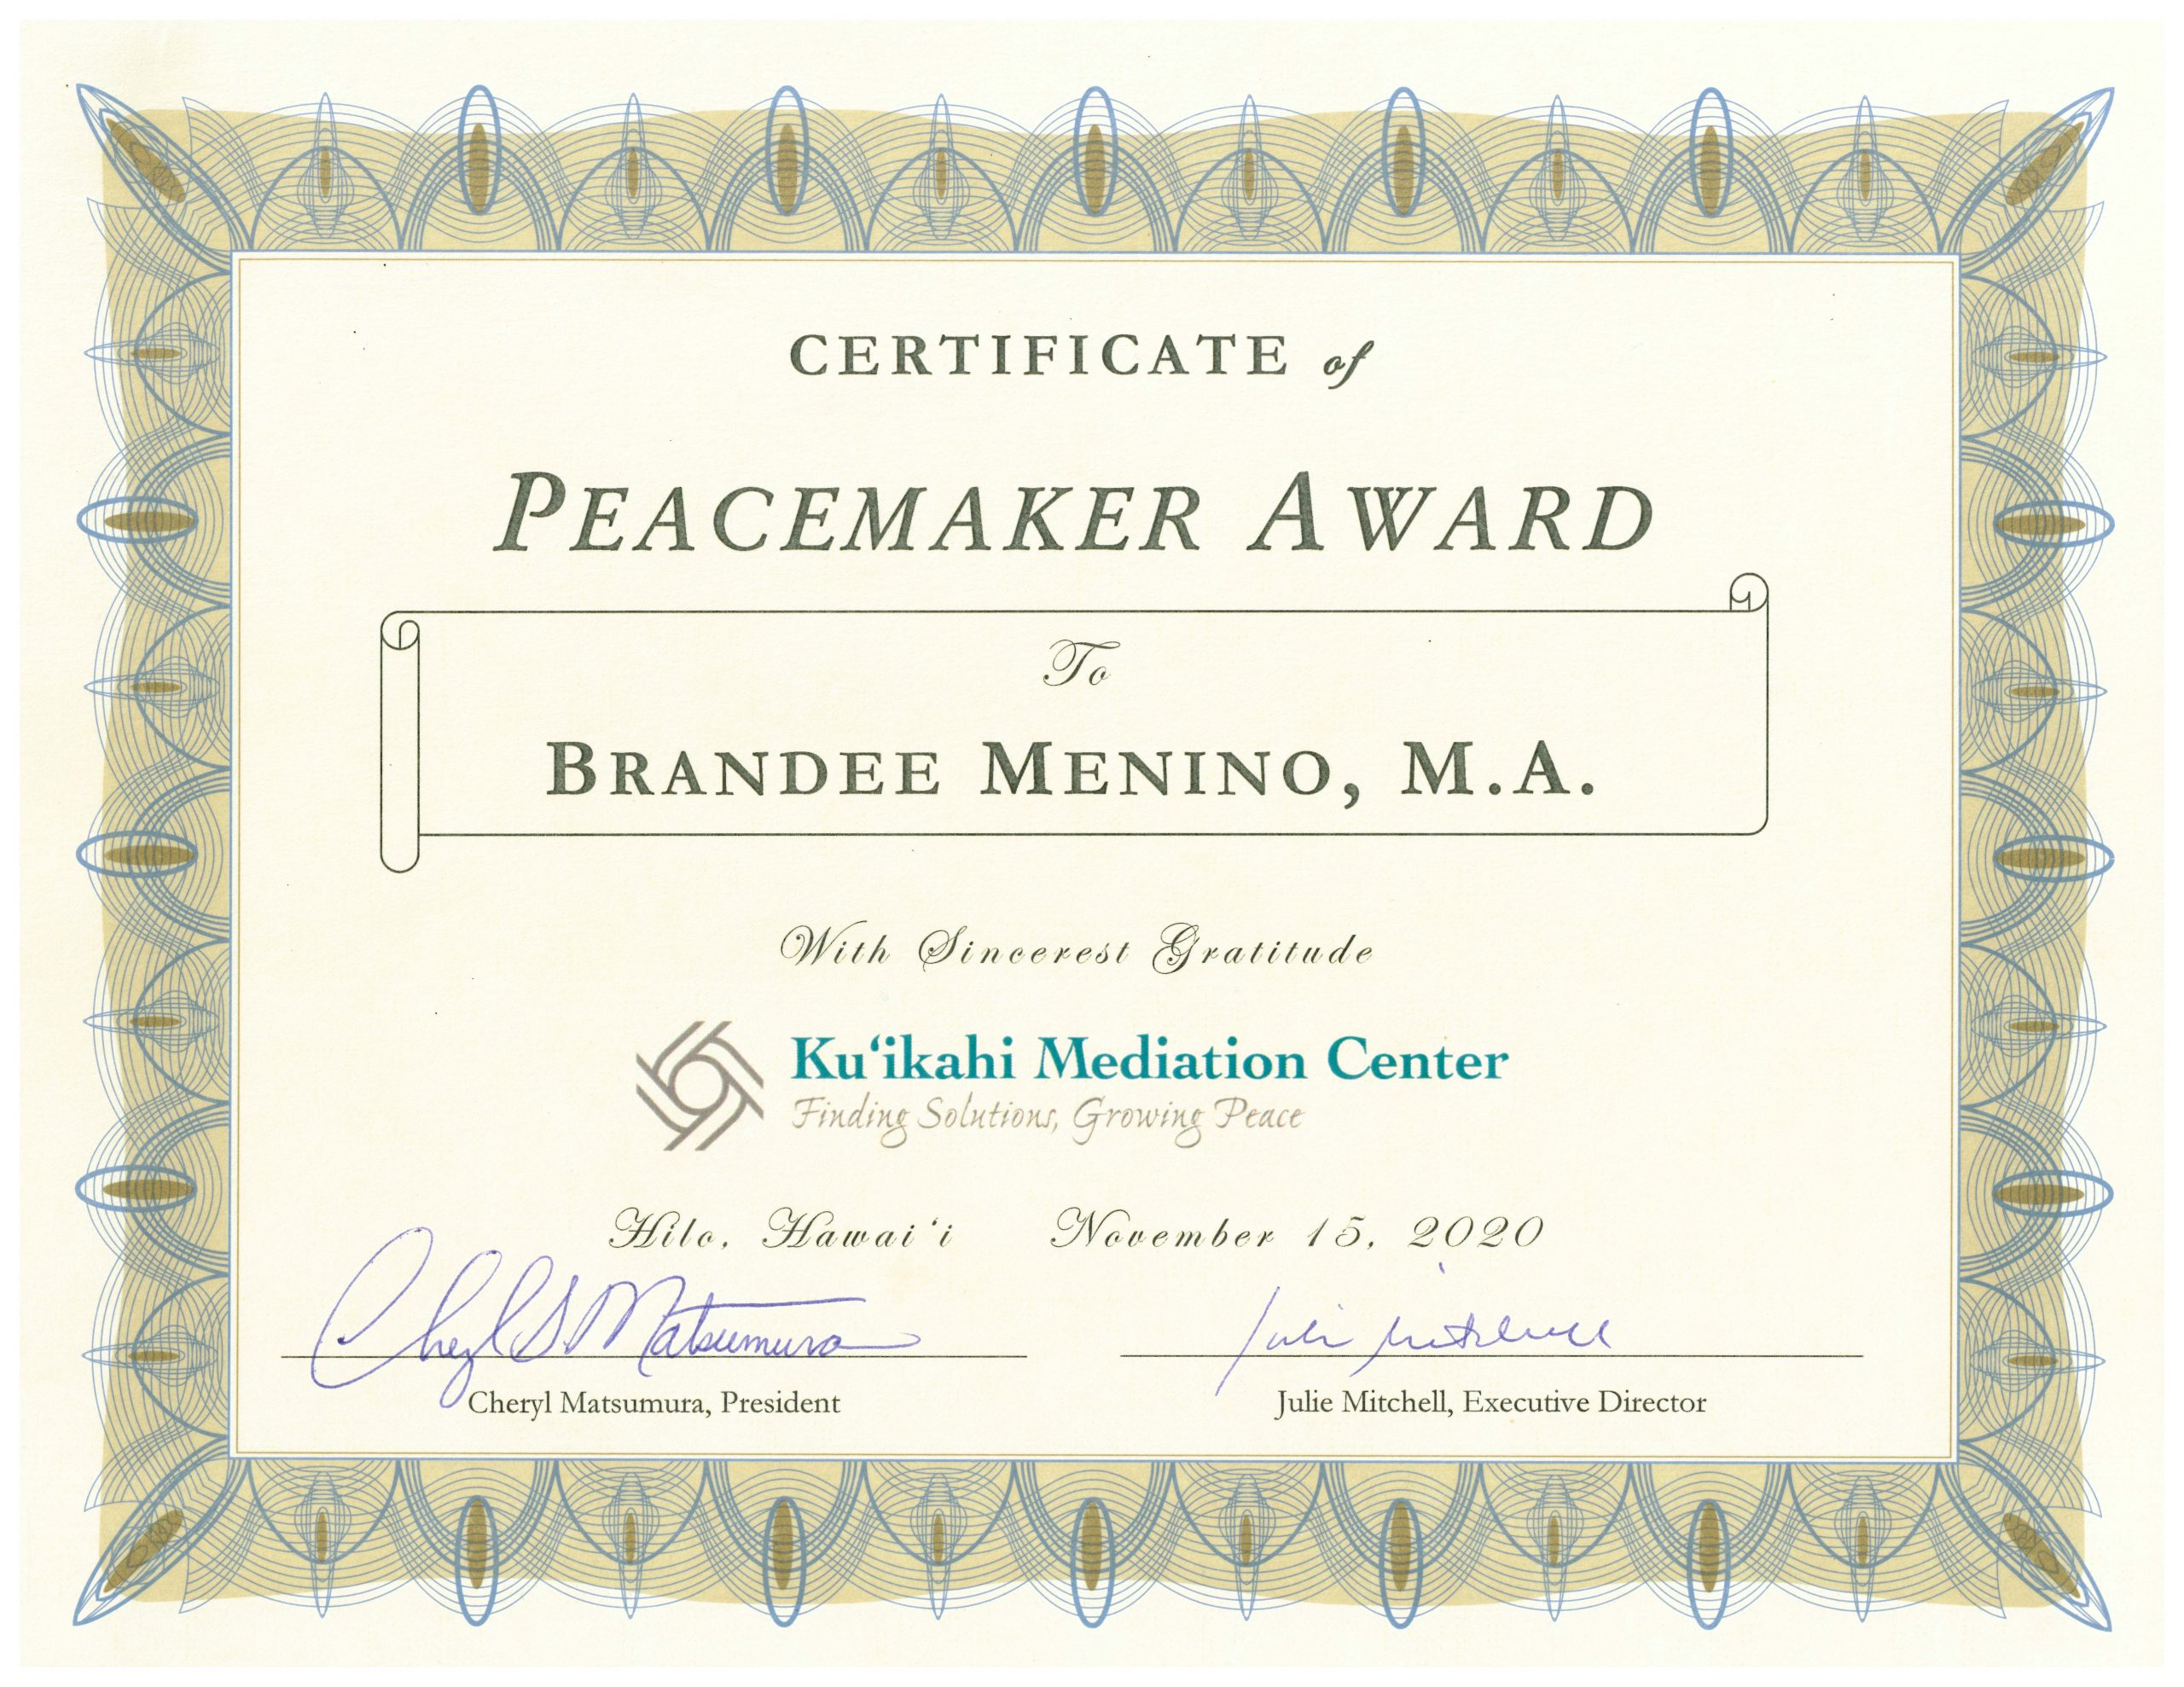 Brandee Menino - Certificate